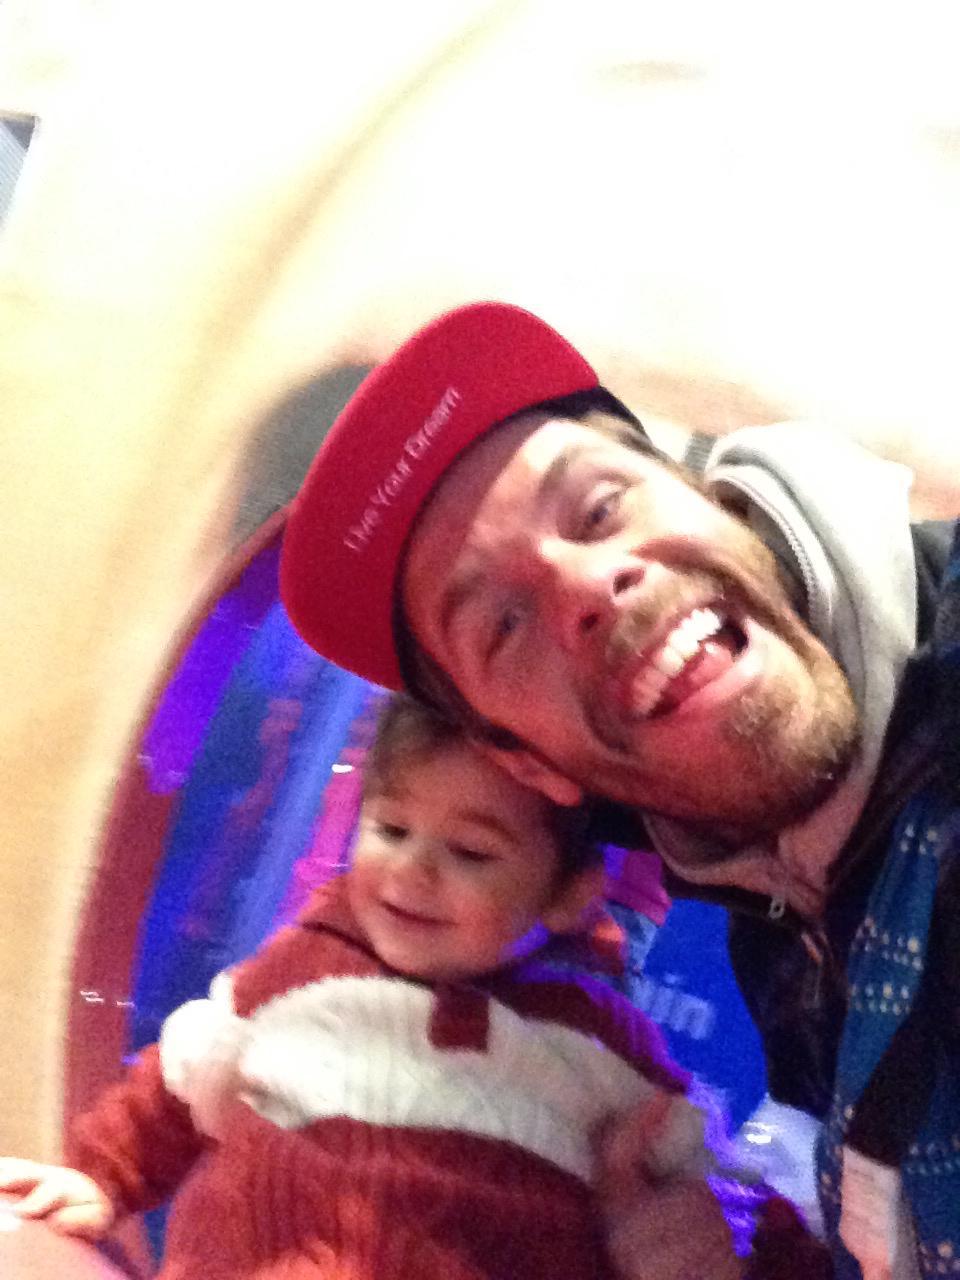 We have too much fun together!! http://t.co/7bu2cWwNWr  #JRhilton http://t.co/wKpCdqZSTa